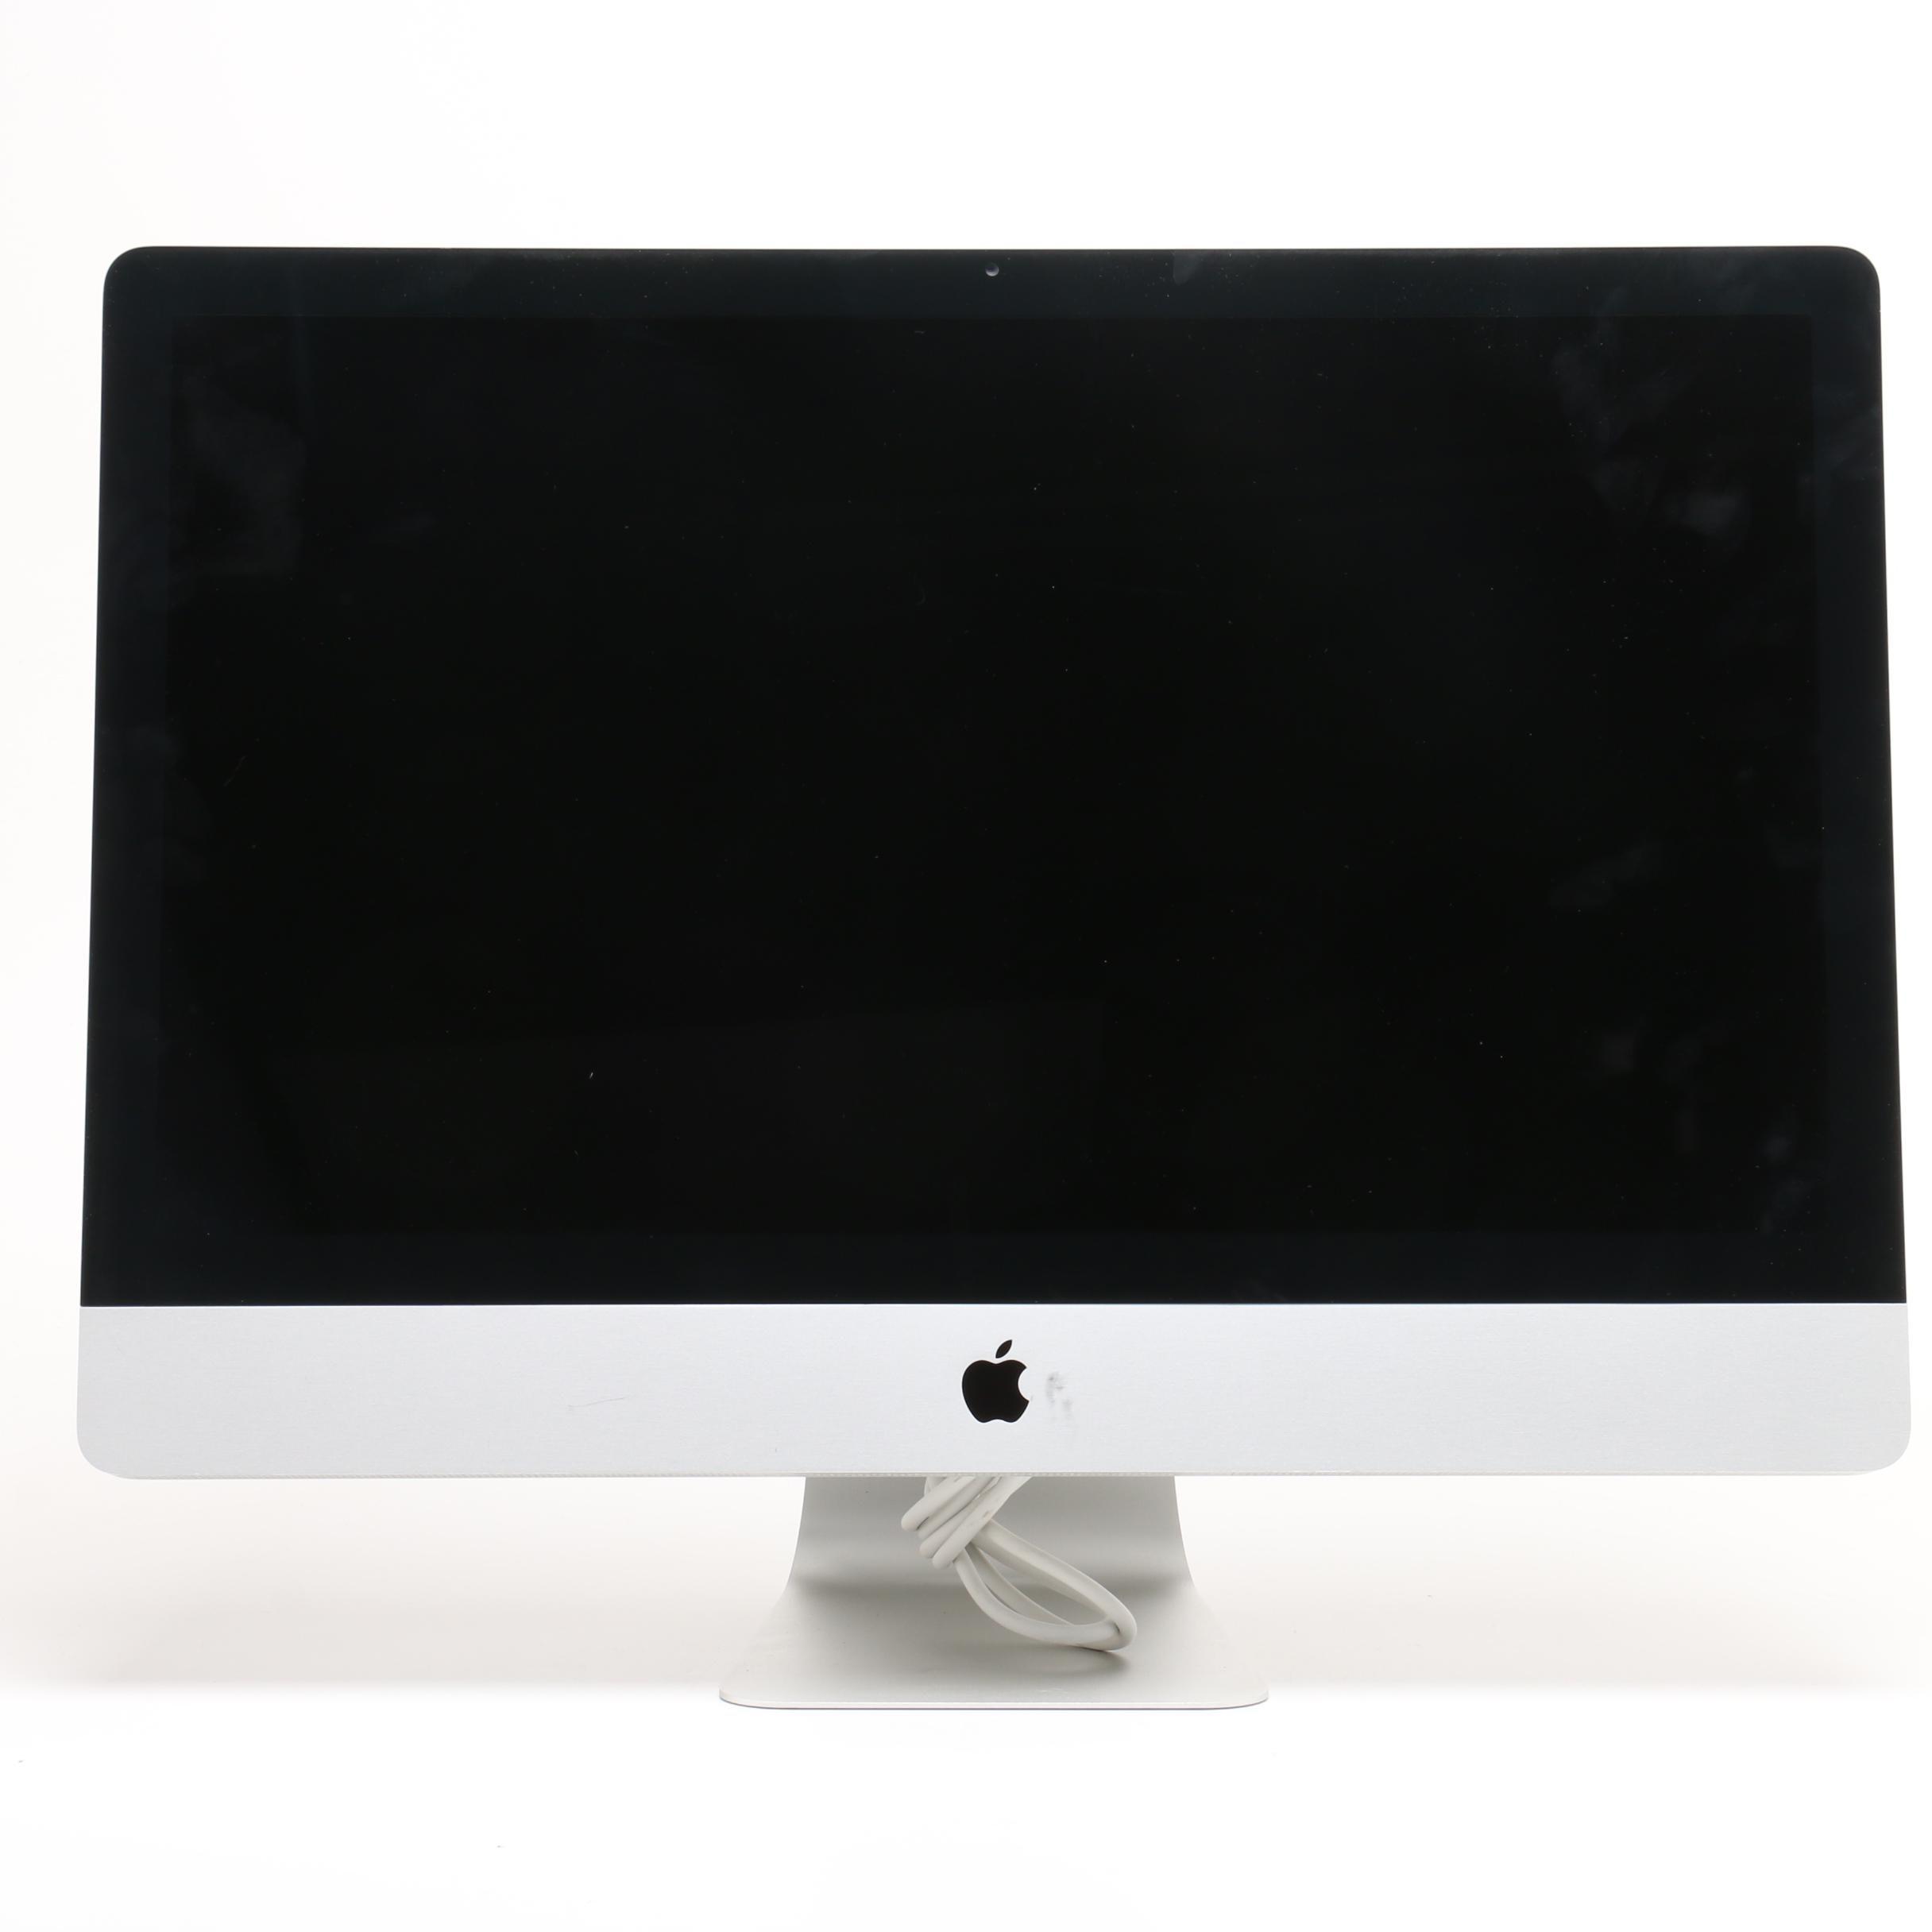 "27"" Apple iMac Desktop Computer"